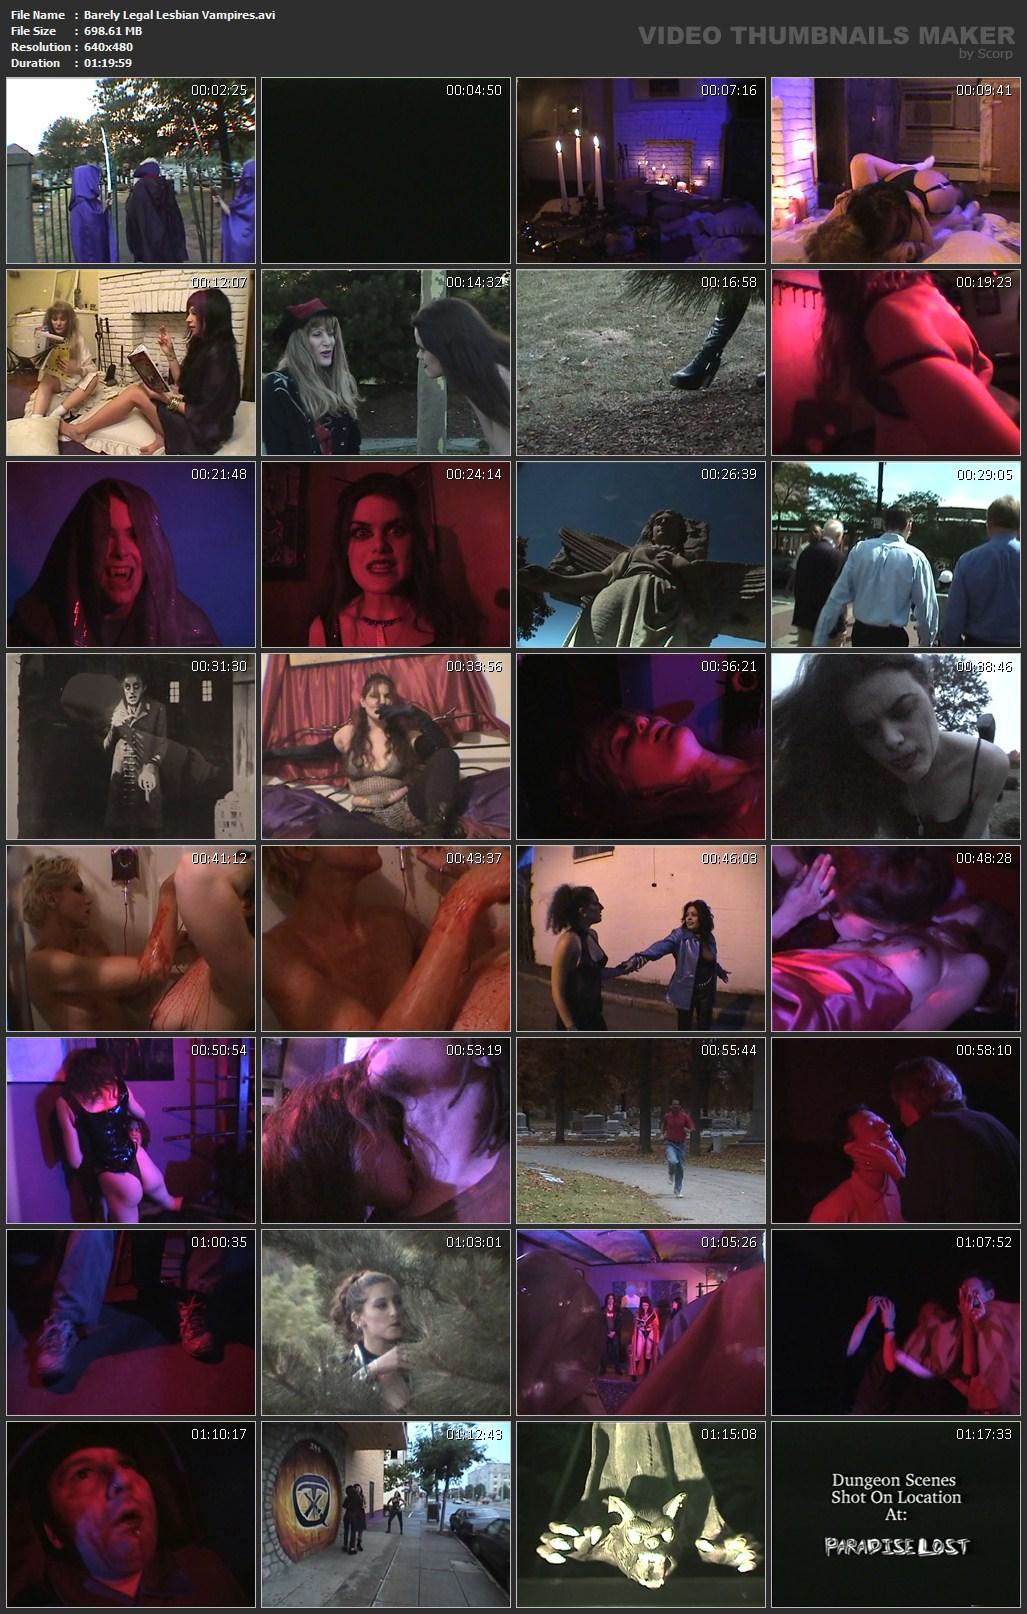 Download legal barley lesbian vampire movies free hentai clip